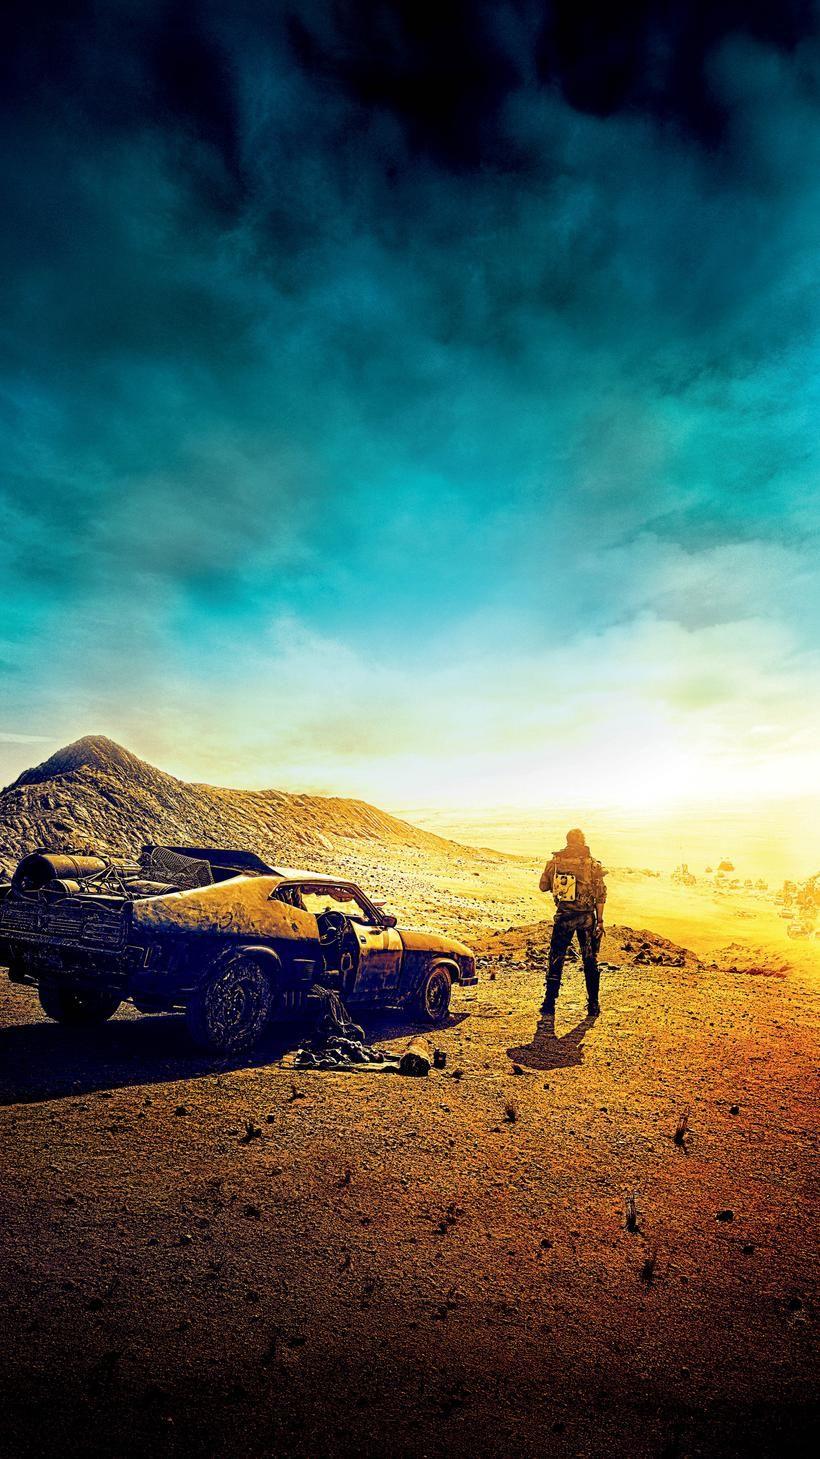 Mad Max Fury Road 2015 Phone Wallpaper Moviemania In 2020 Mad Max Fury Road Mad Max Mad Max Poster